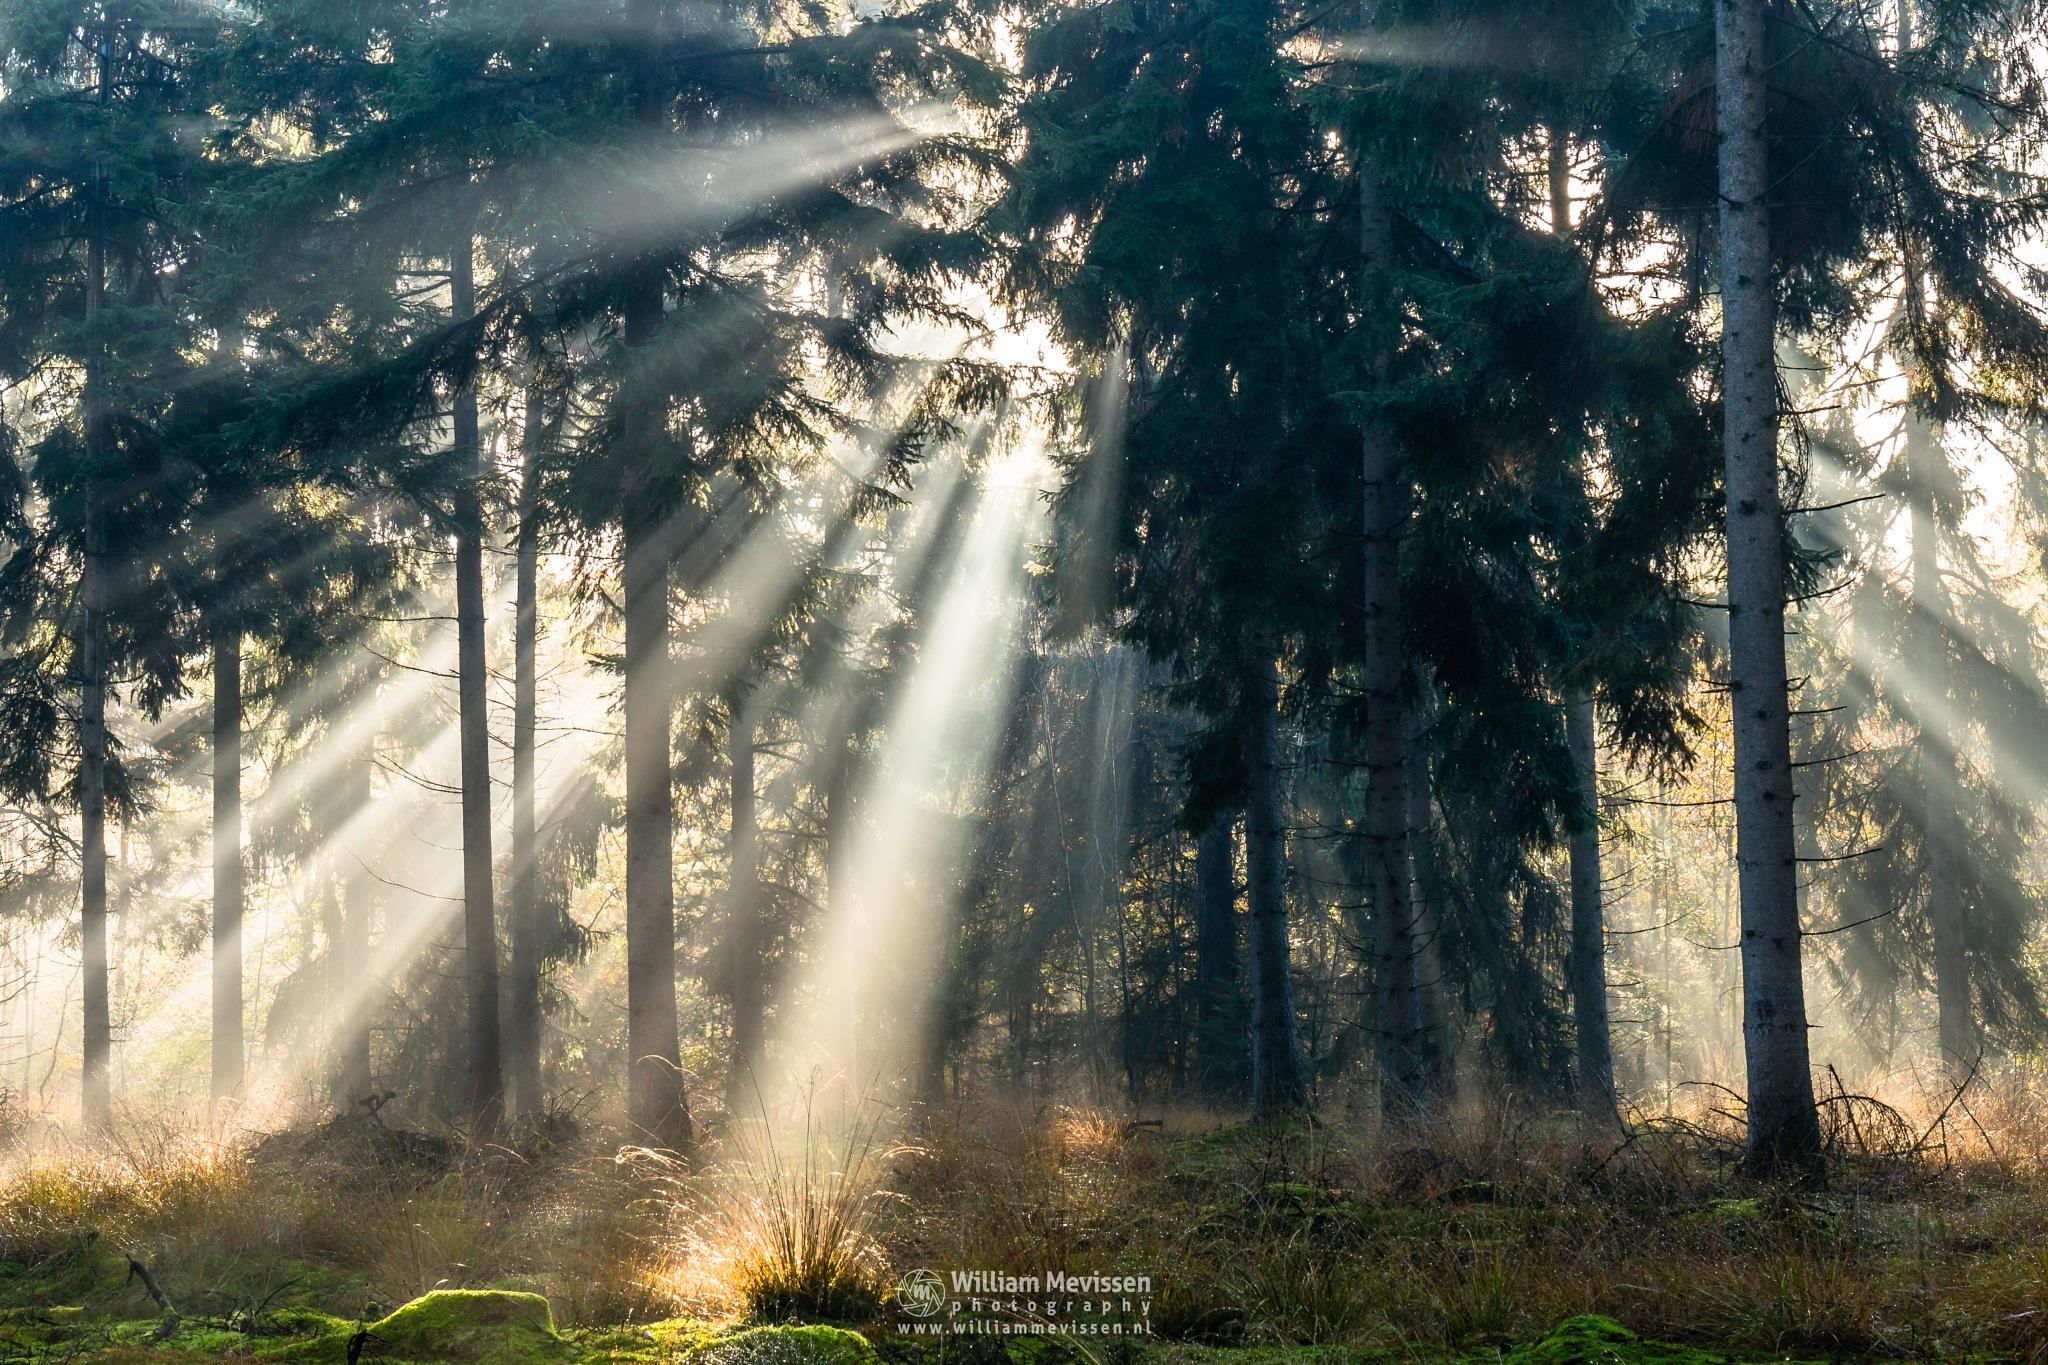 Sunlight In The Forest by William Mevissen